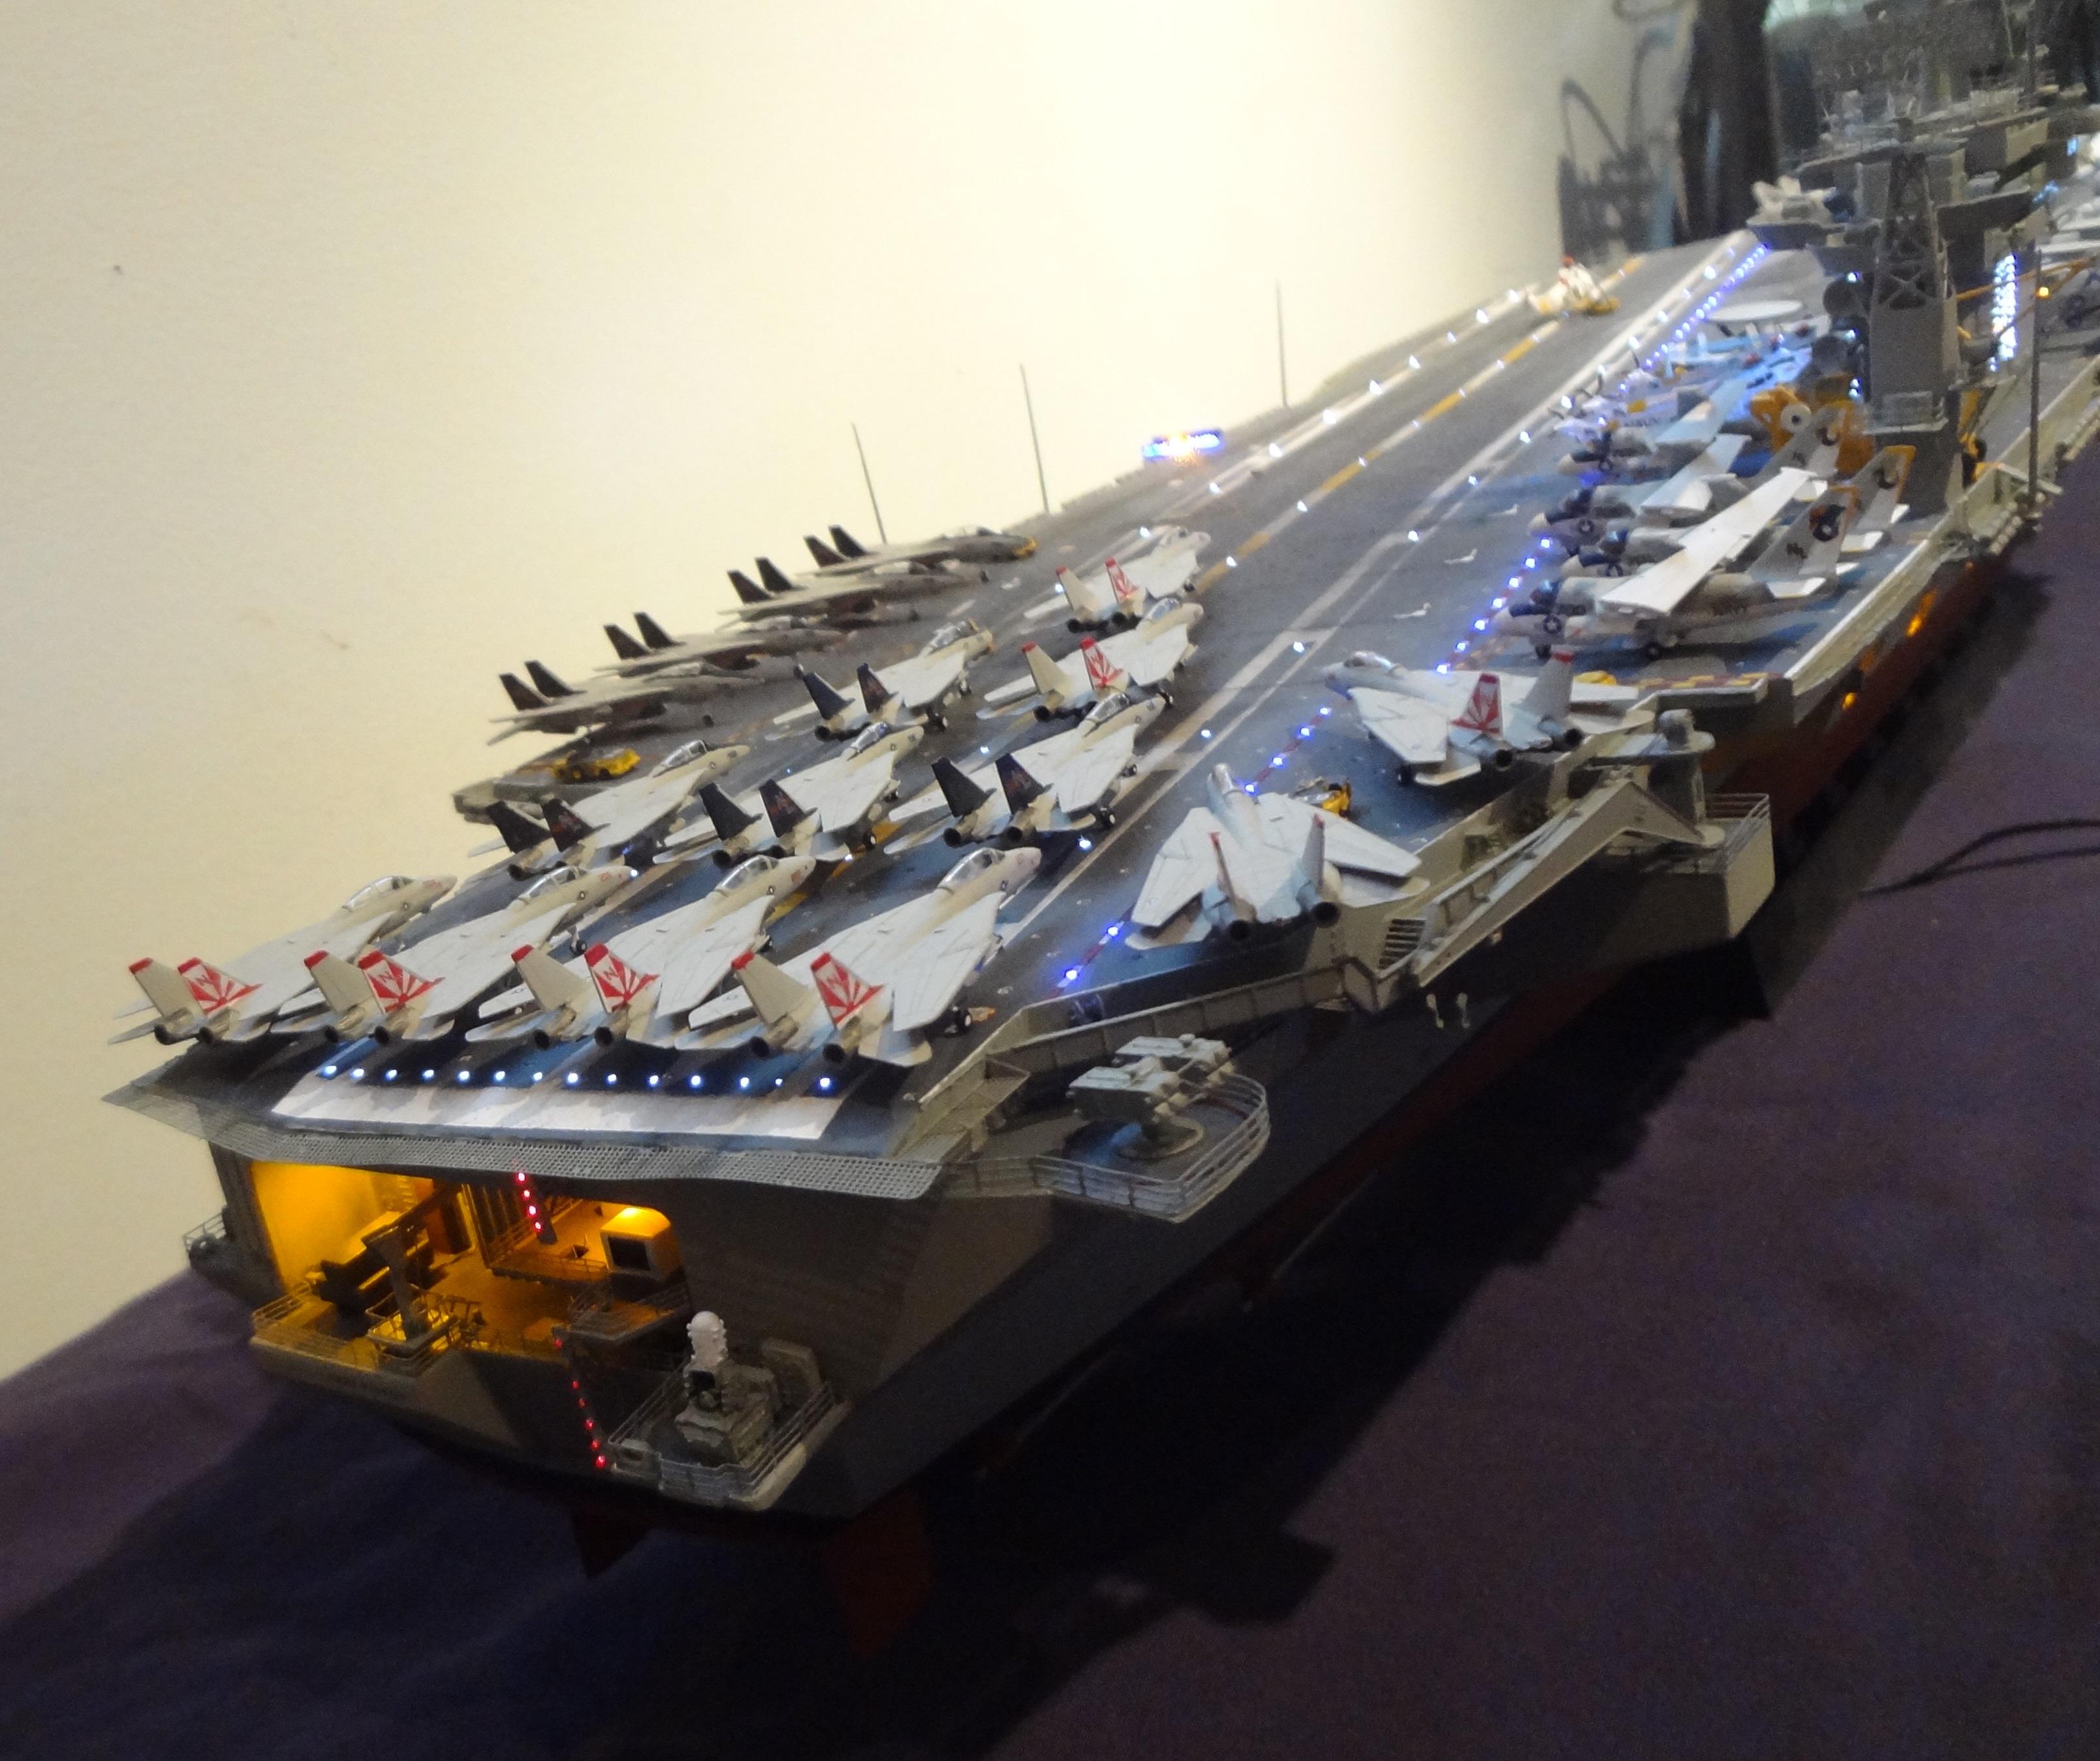 Superdetail Conversion – Trumpeter 1/350 Nimitz to Carl